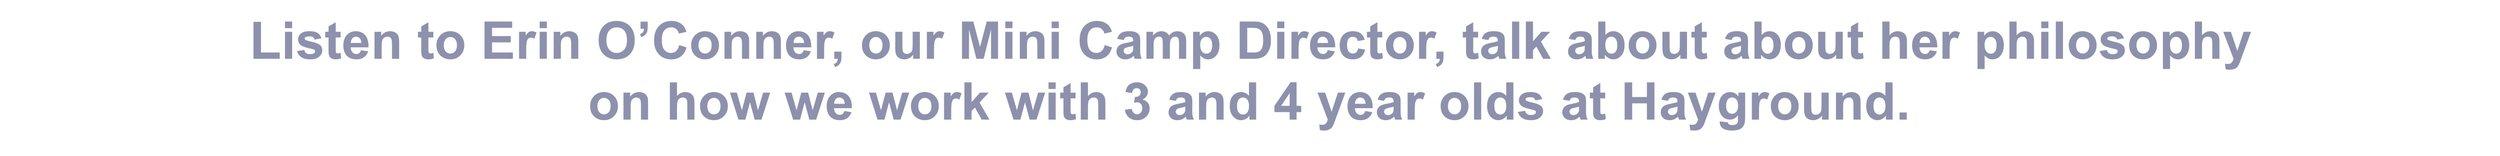 Listen to Erin O'Conner, our Mini Camp Director, talk.. copy.jpg